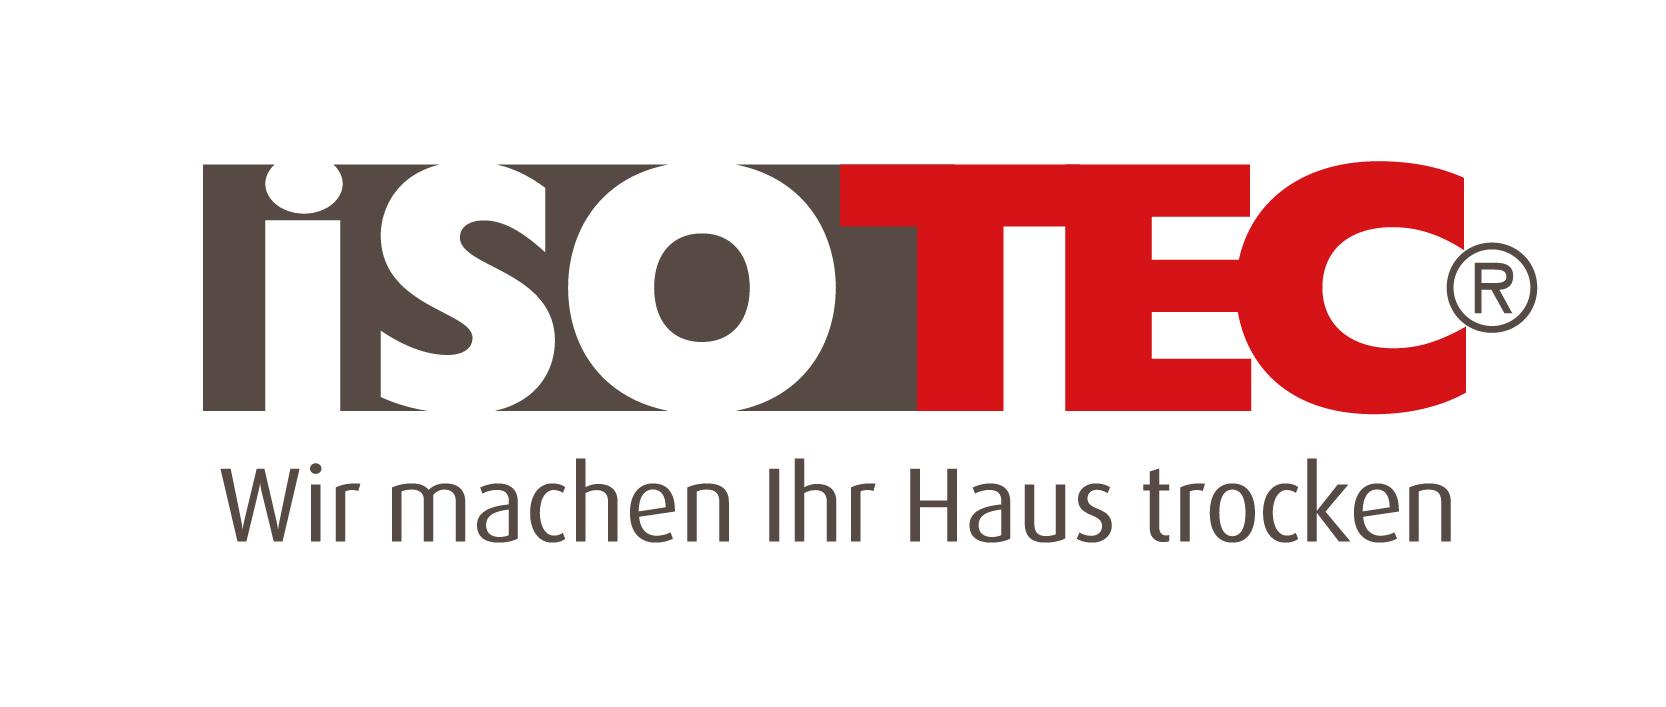 ISOTEC-Fachbetrieb Gebr. Becker GmbH